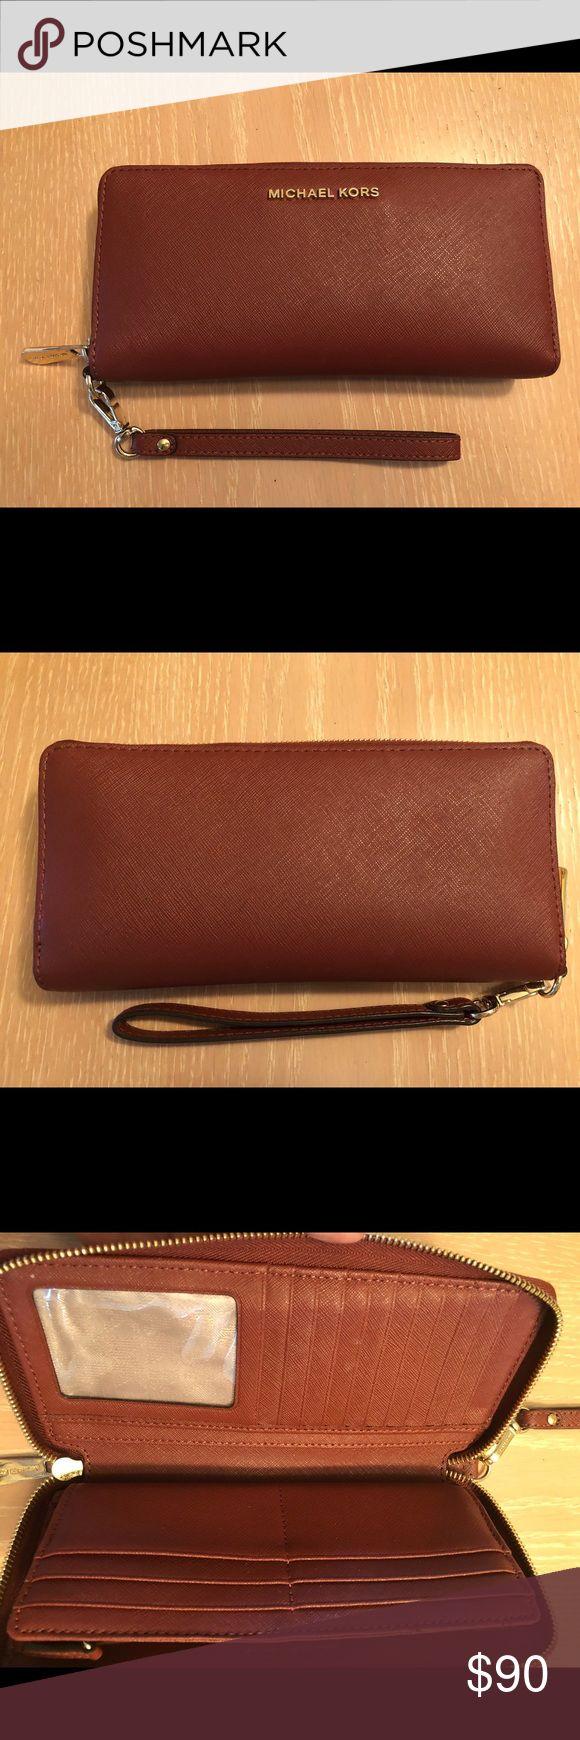 Michael Kors Jet Set Travel Continental wallet MK jet set travel continental wallet.  Color- Brick Size- 8.5x4.5 in Michael Kors Bags Wallets